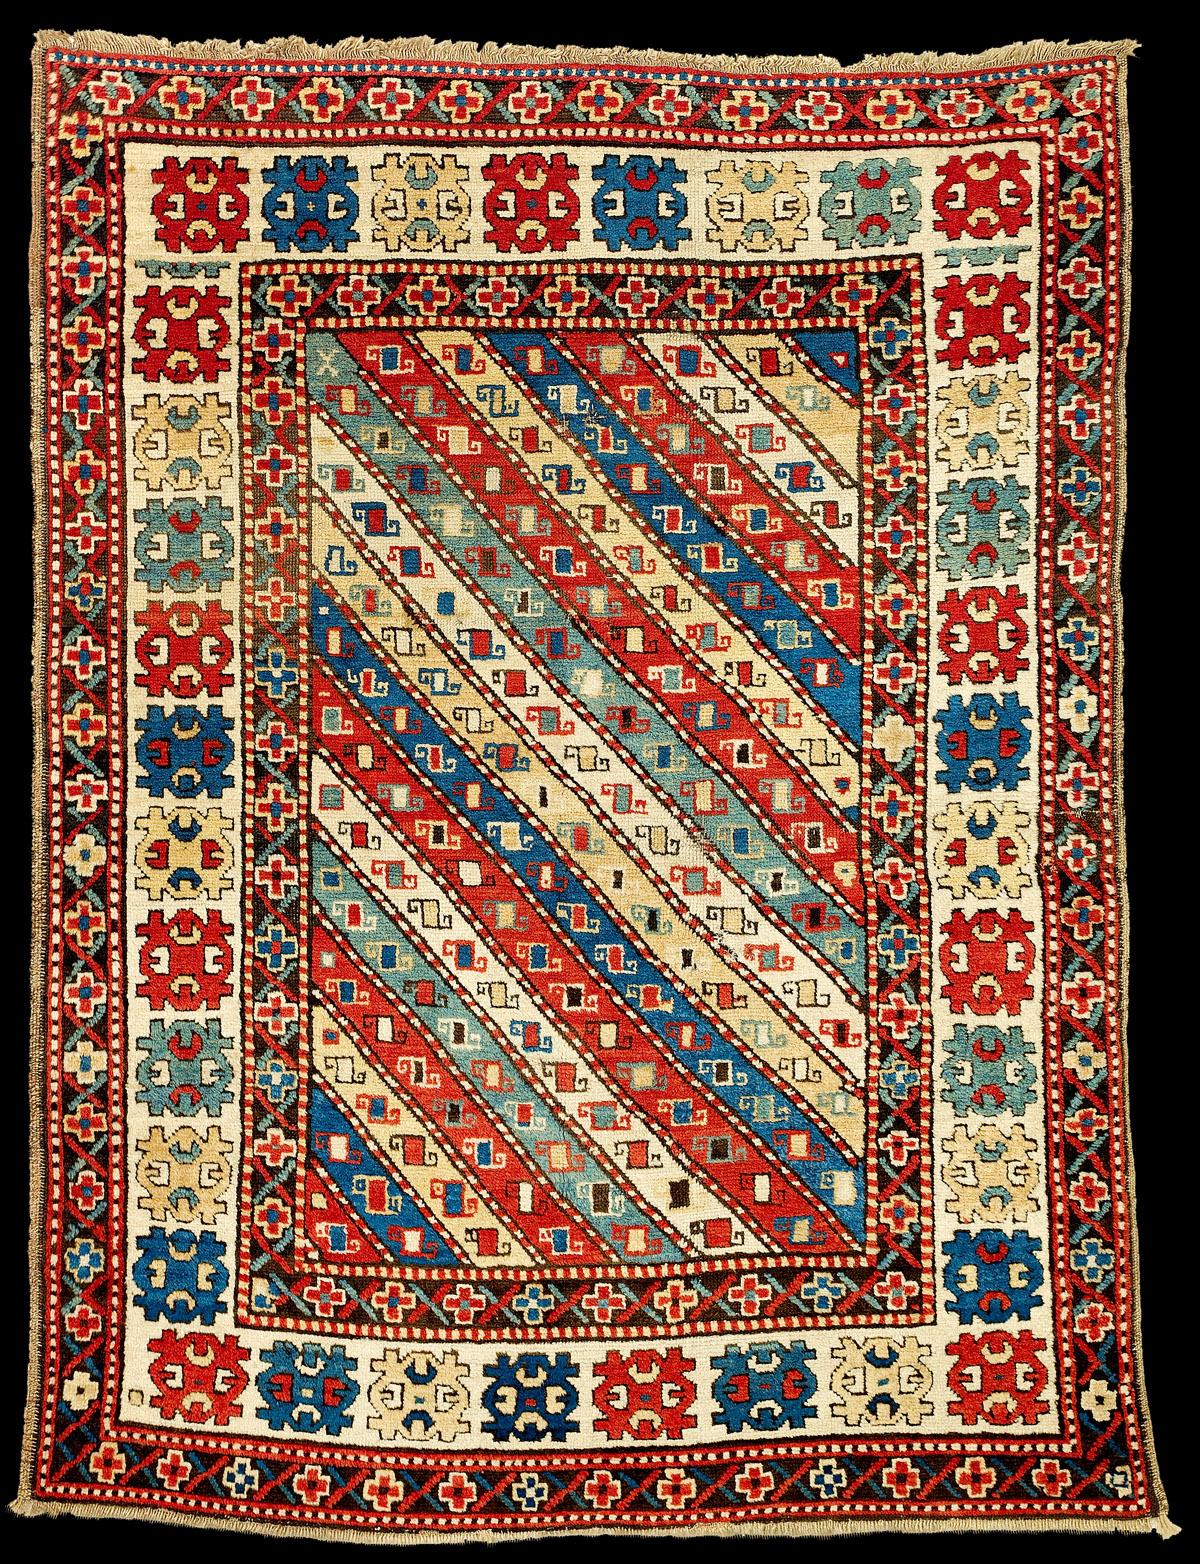 Antique Ganja Carpet With The Colourful Diagonal Stripes